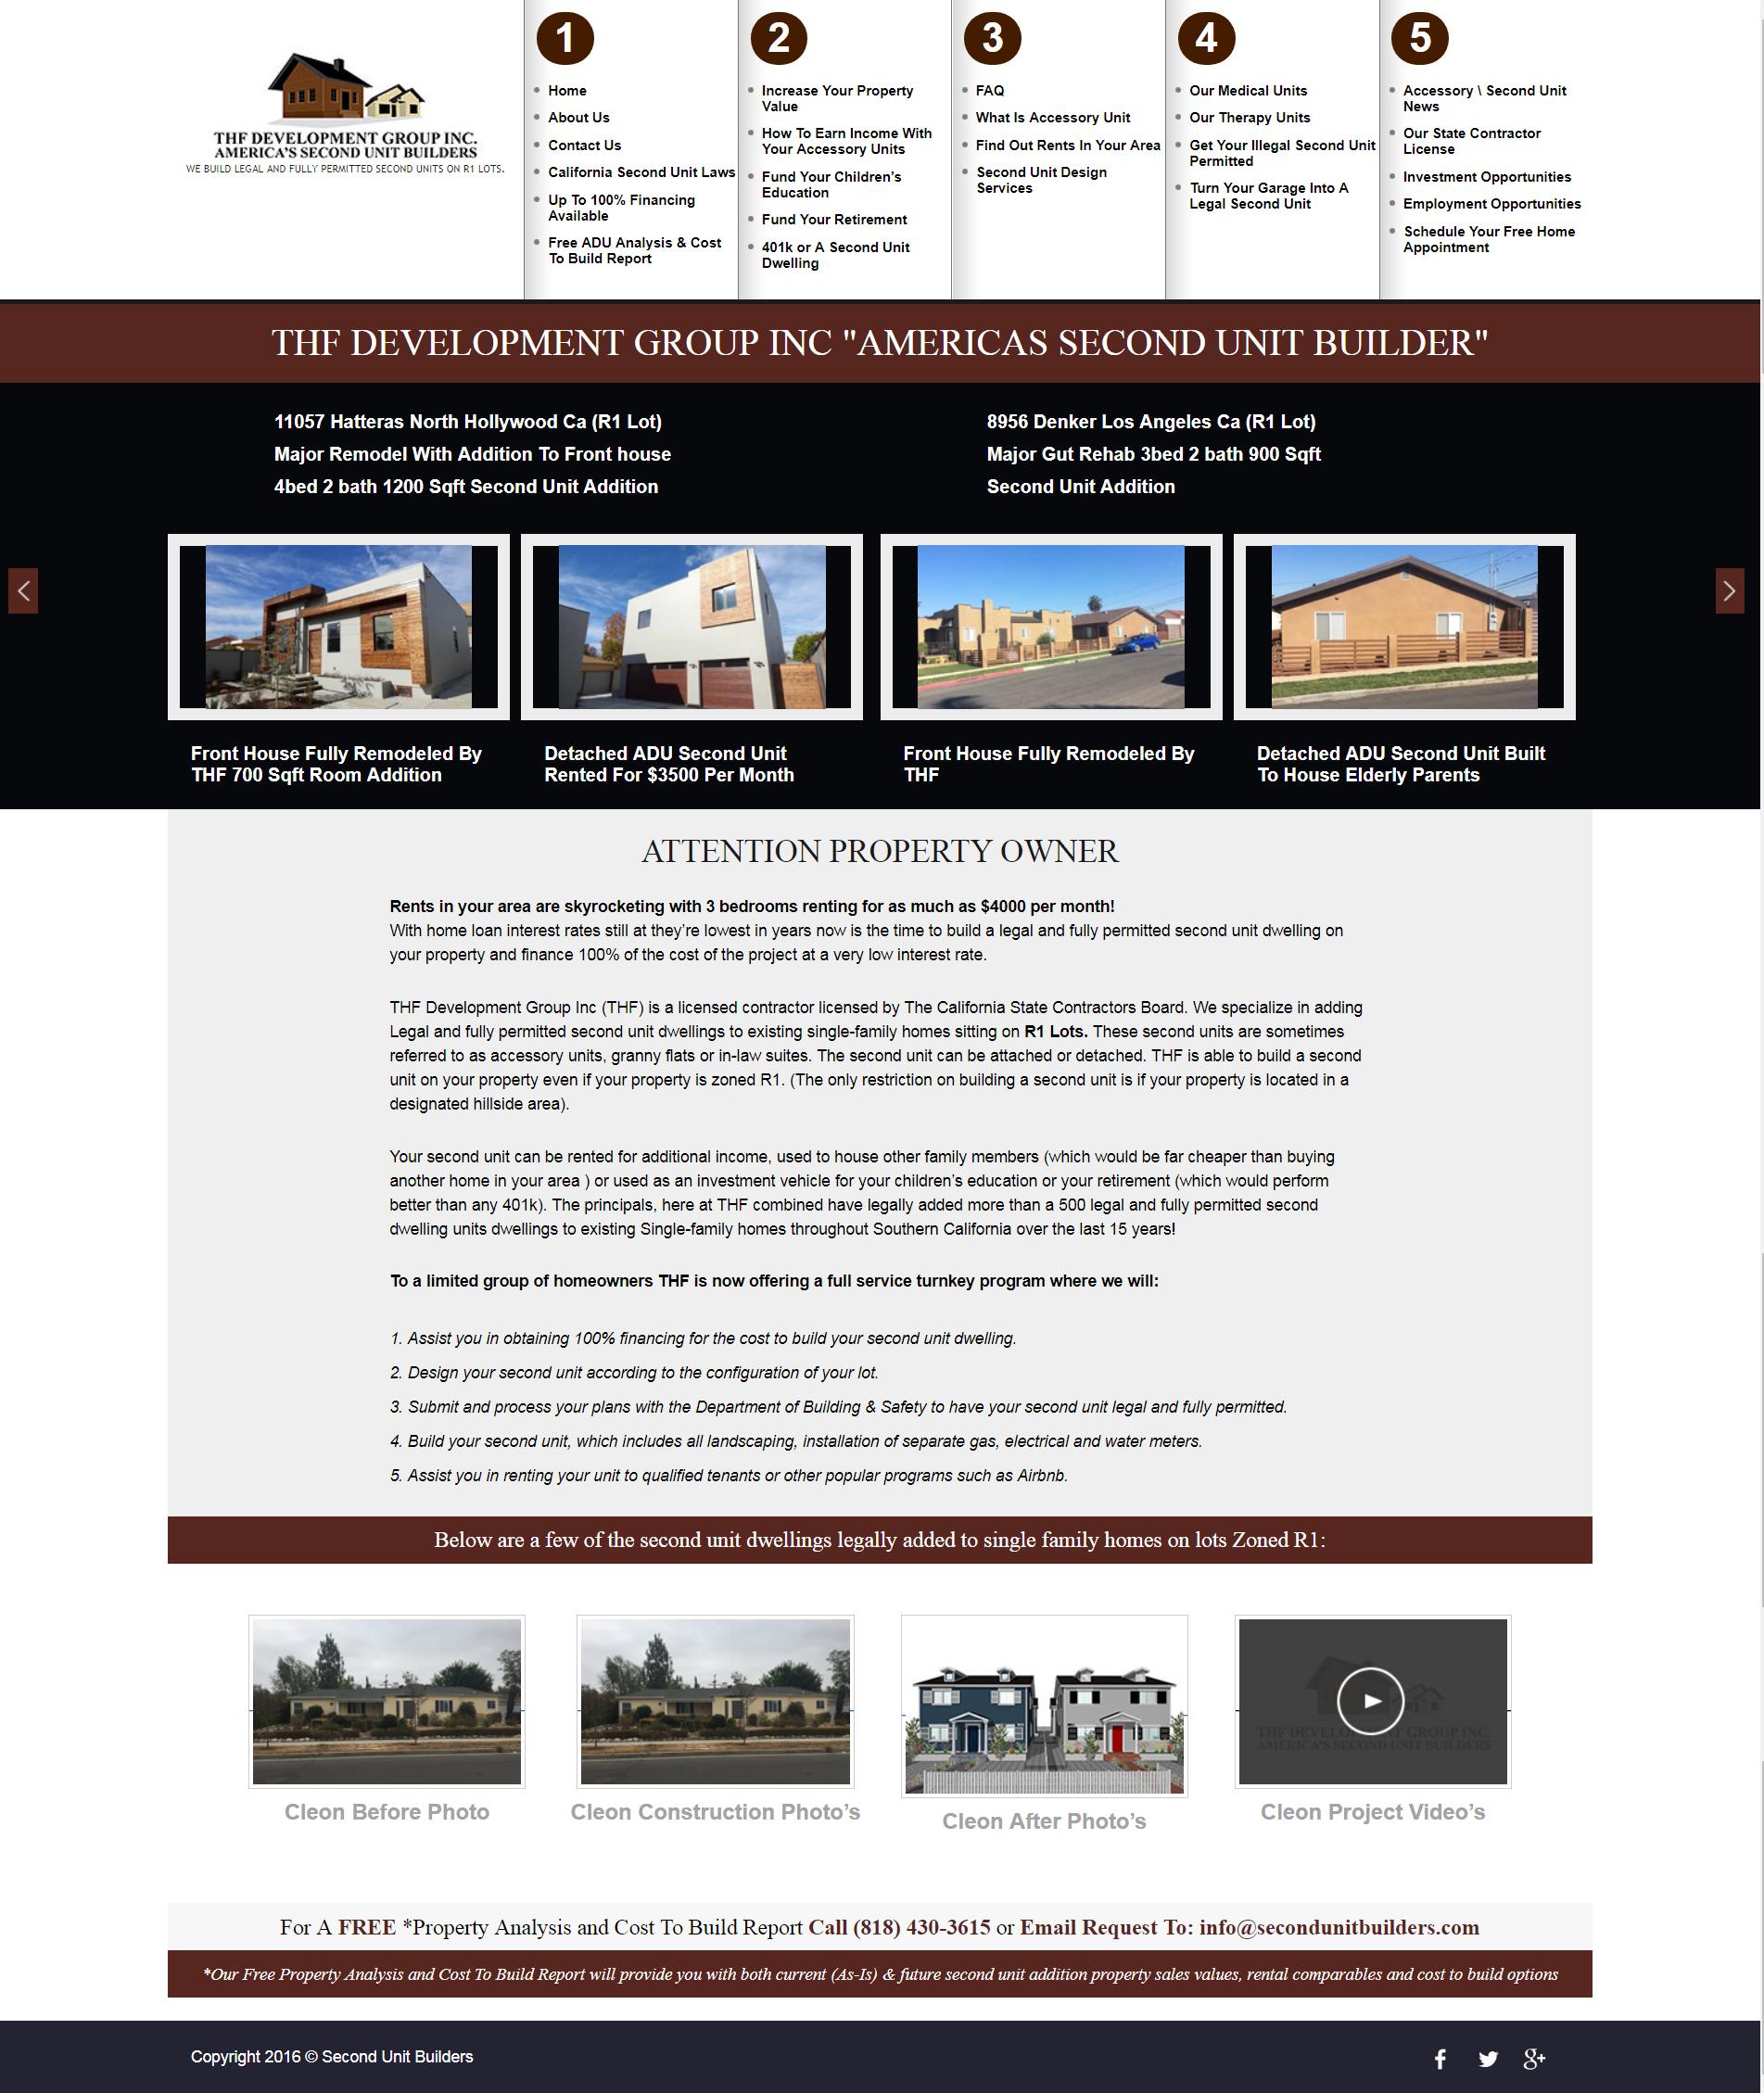 Second Unit Builders - Sibz Solutions